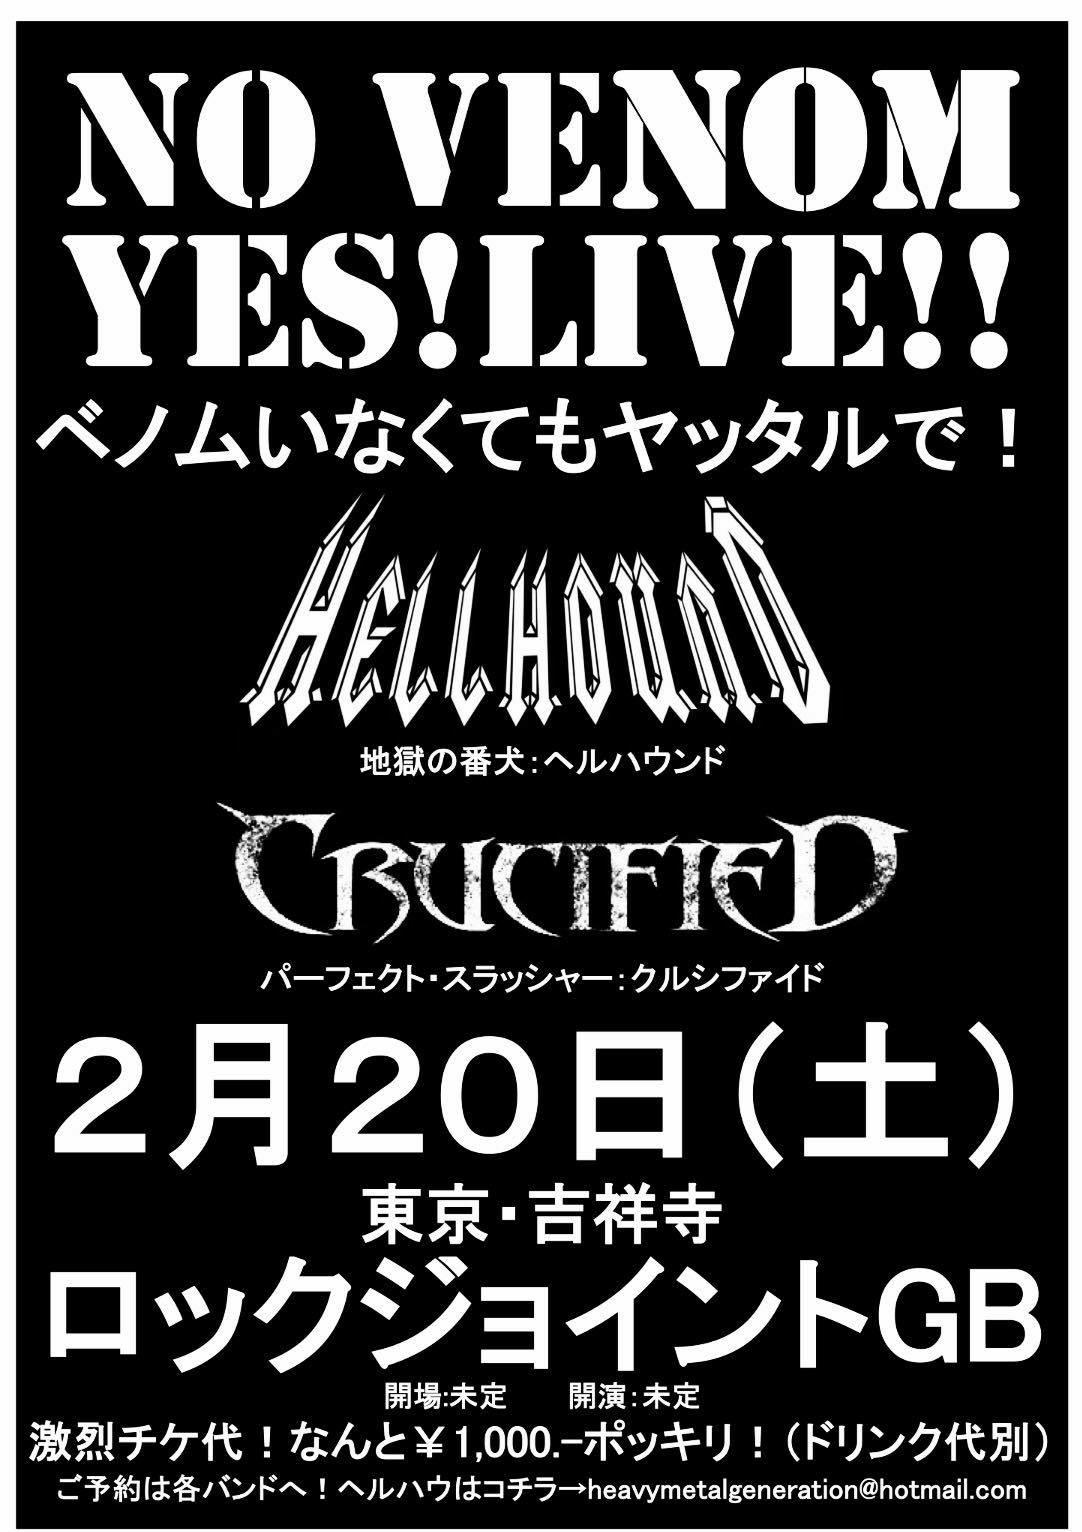 2/20 HELLHOUND Live